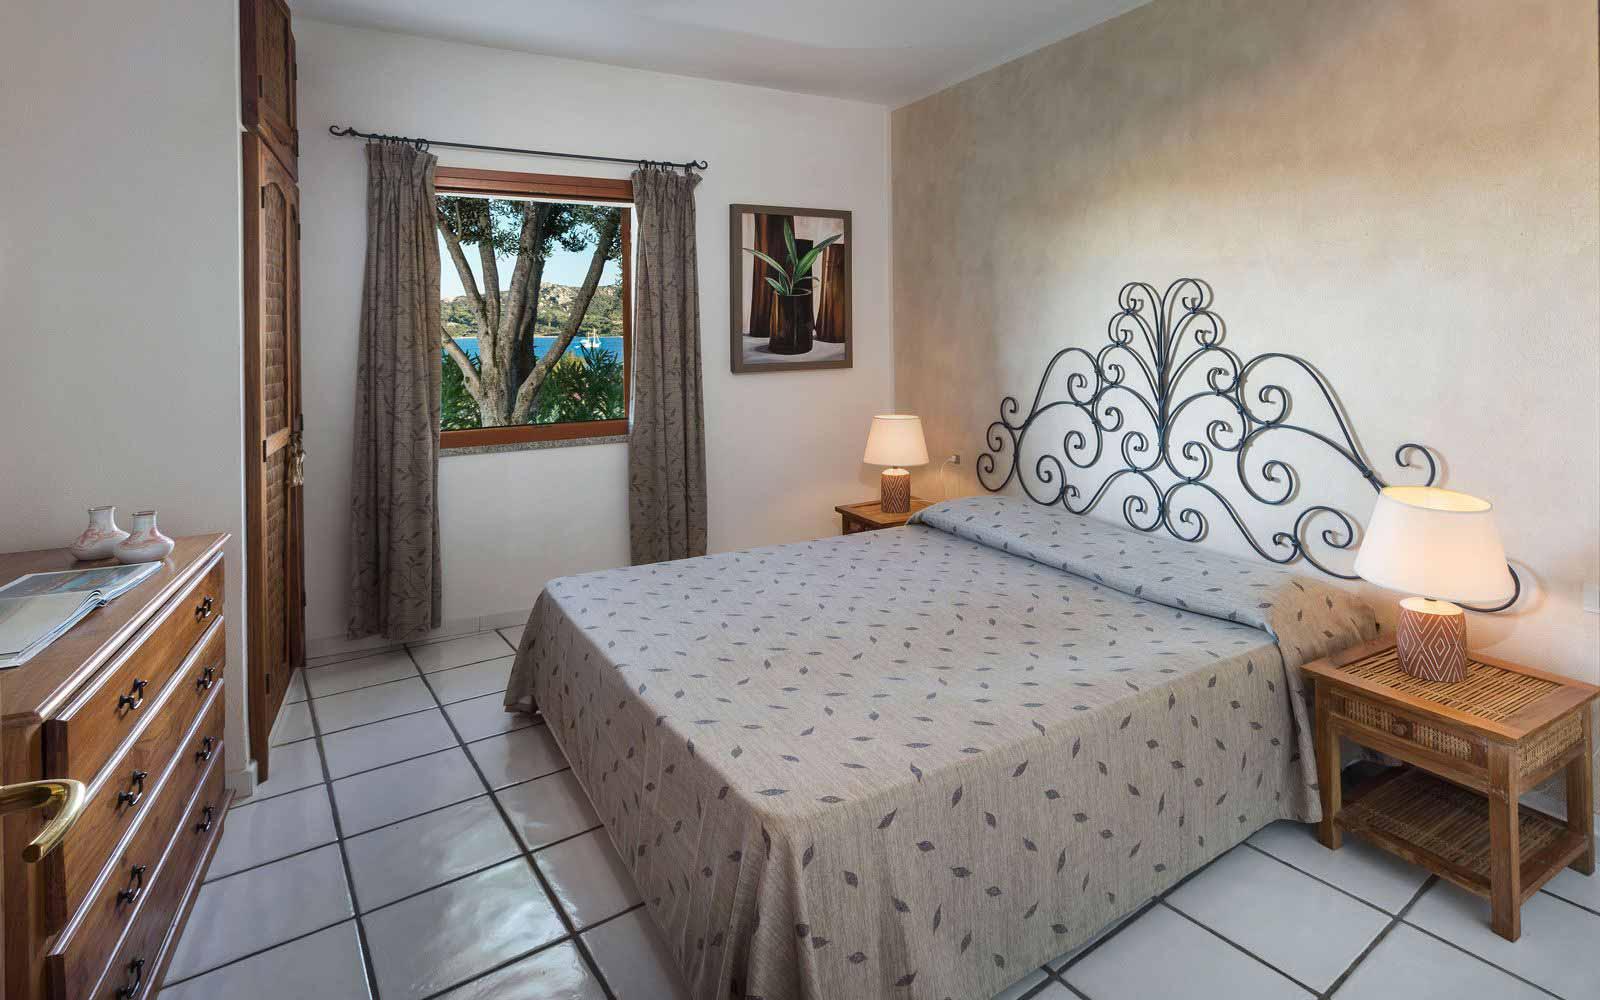 Double bedroom at Resort Cala di Falco - Villas